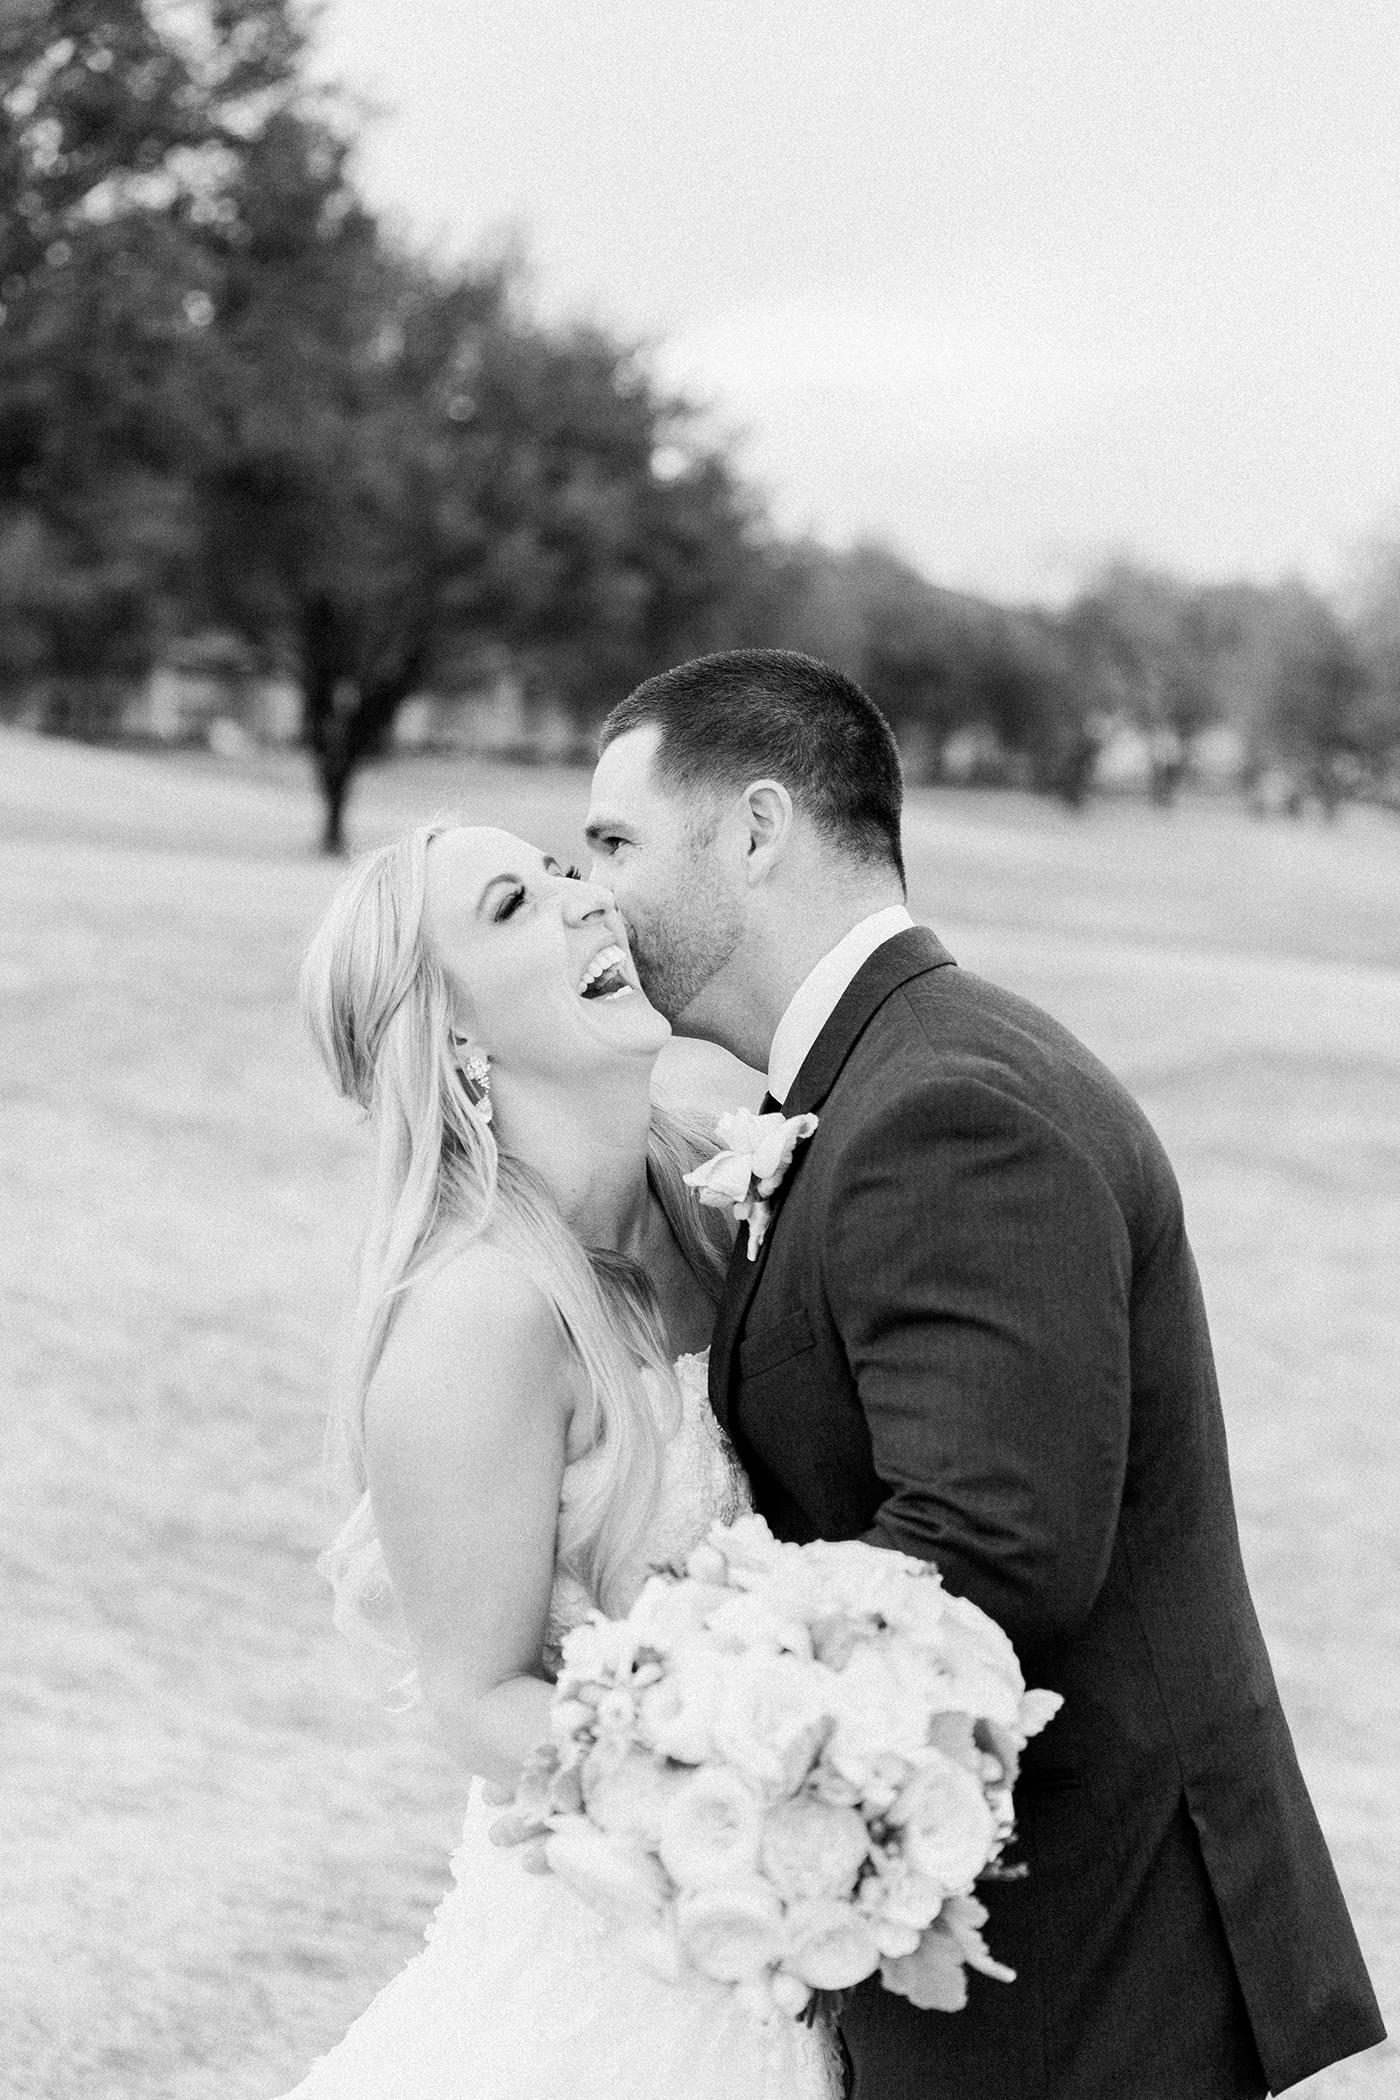 DFW Wedding Planner - Caroline + Jeff at The Four Seasons Hotel Wedding - Allday Events - 135.jpg